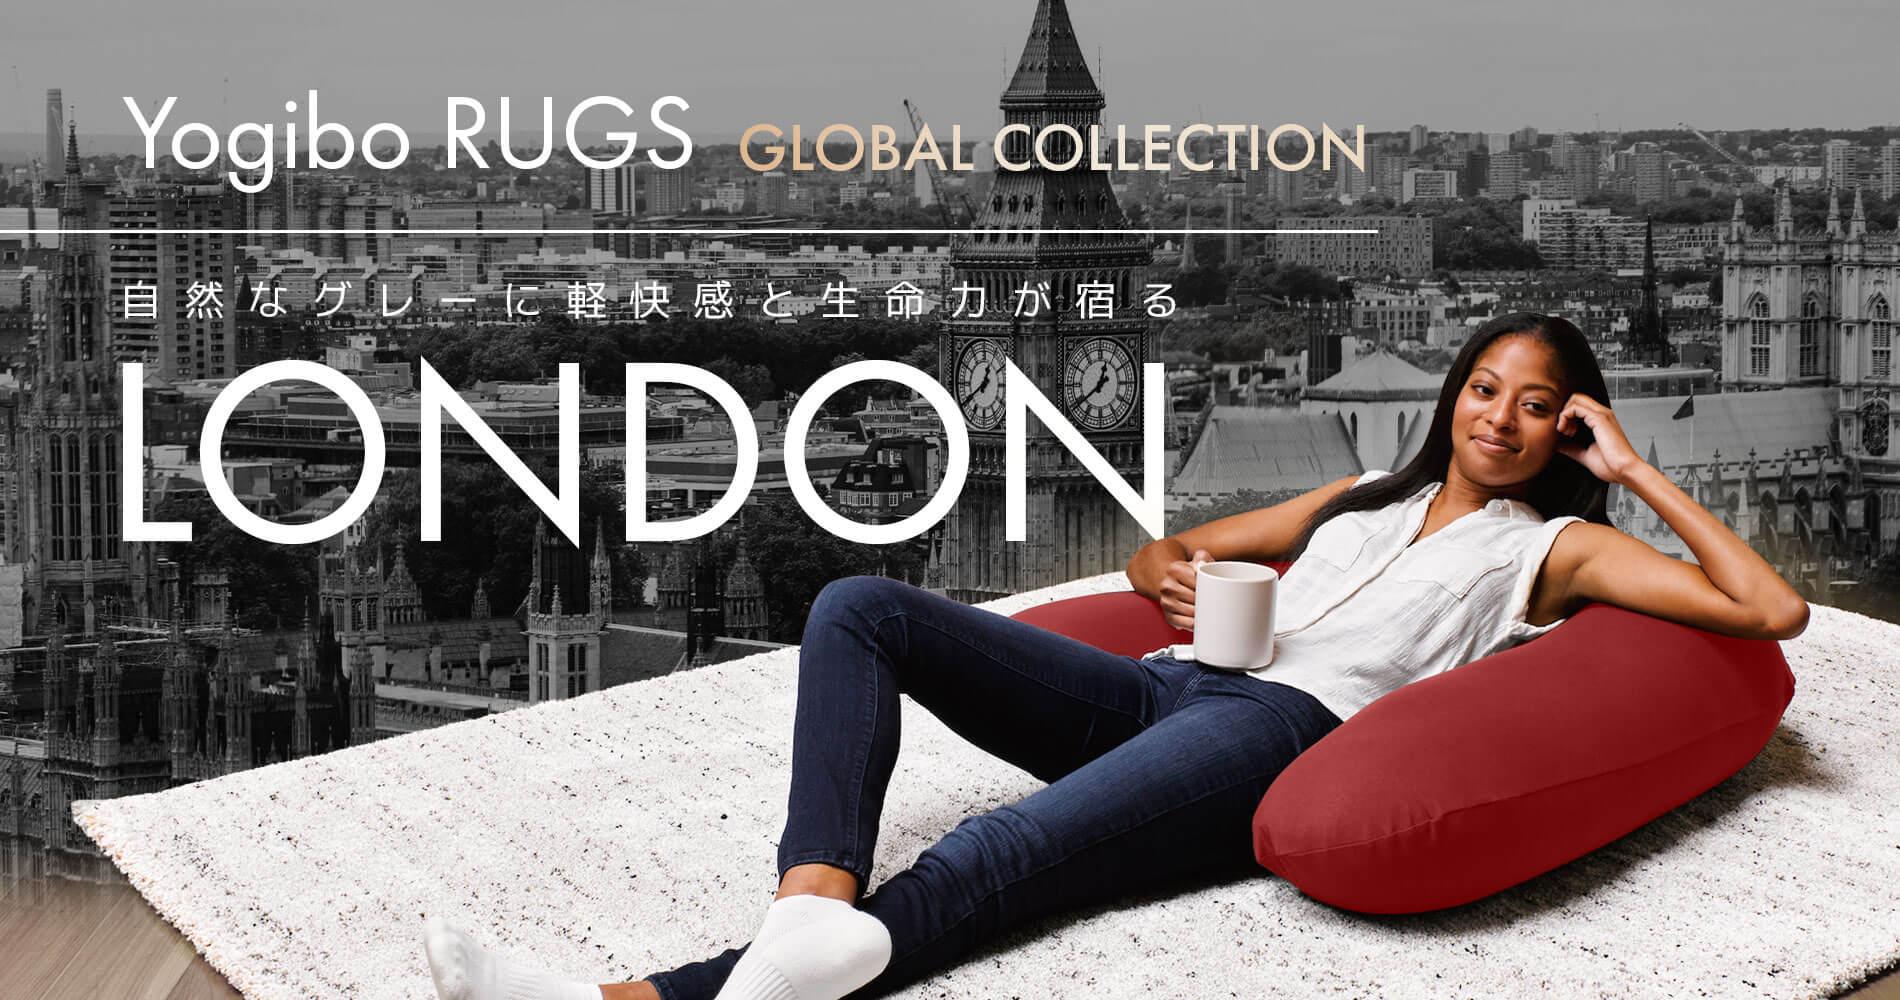 Yogibo Rugs London(ヨギボーラグ ロンドン)